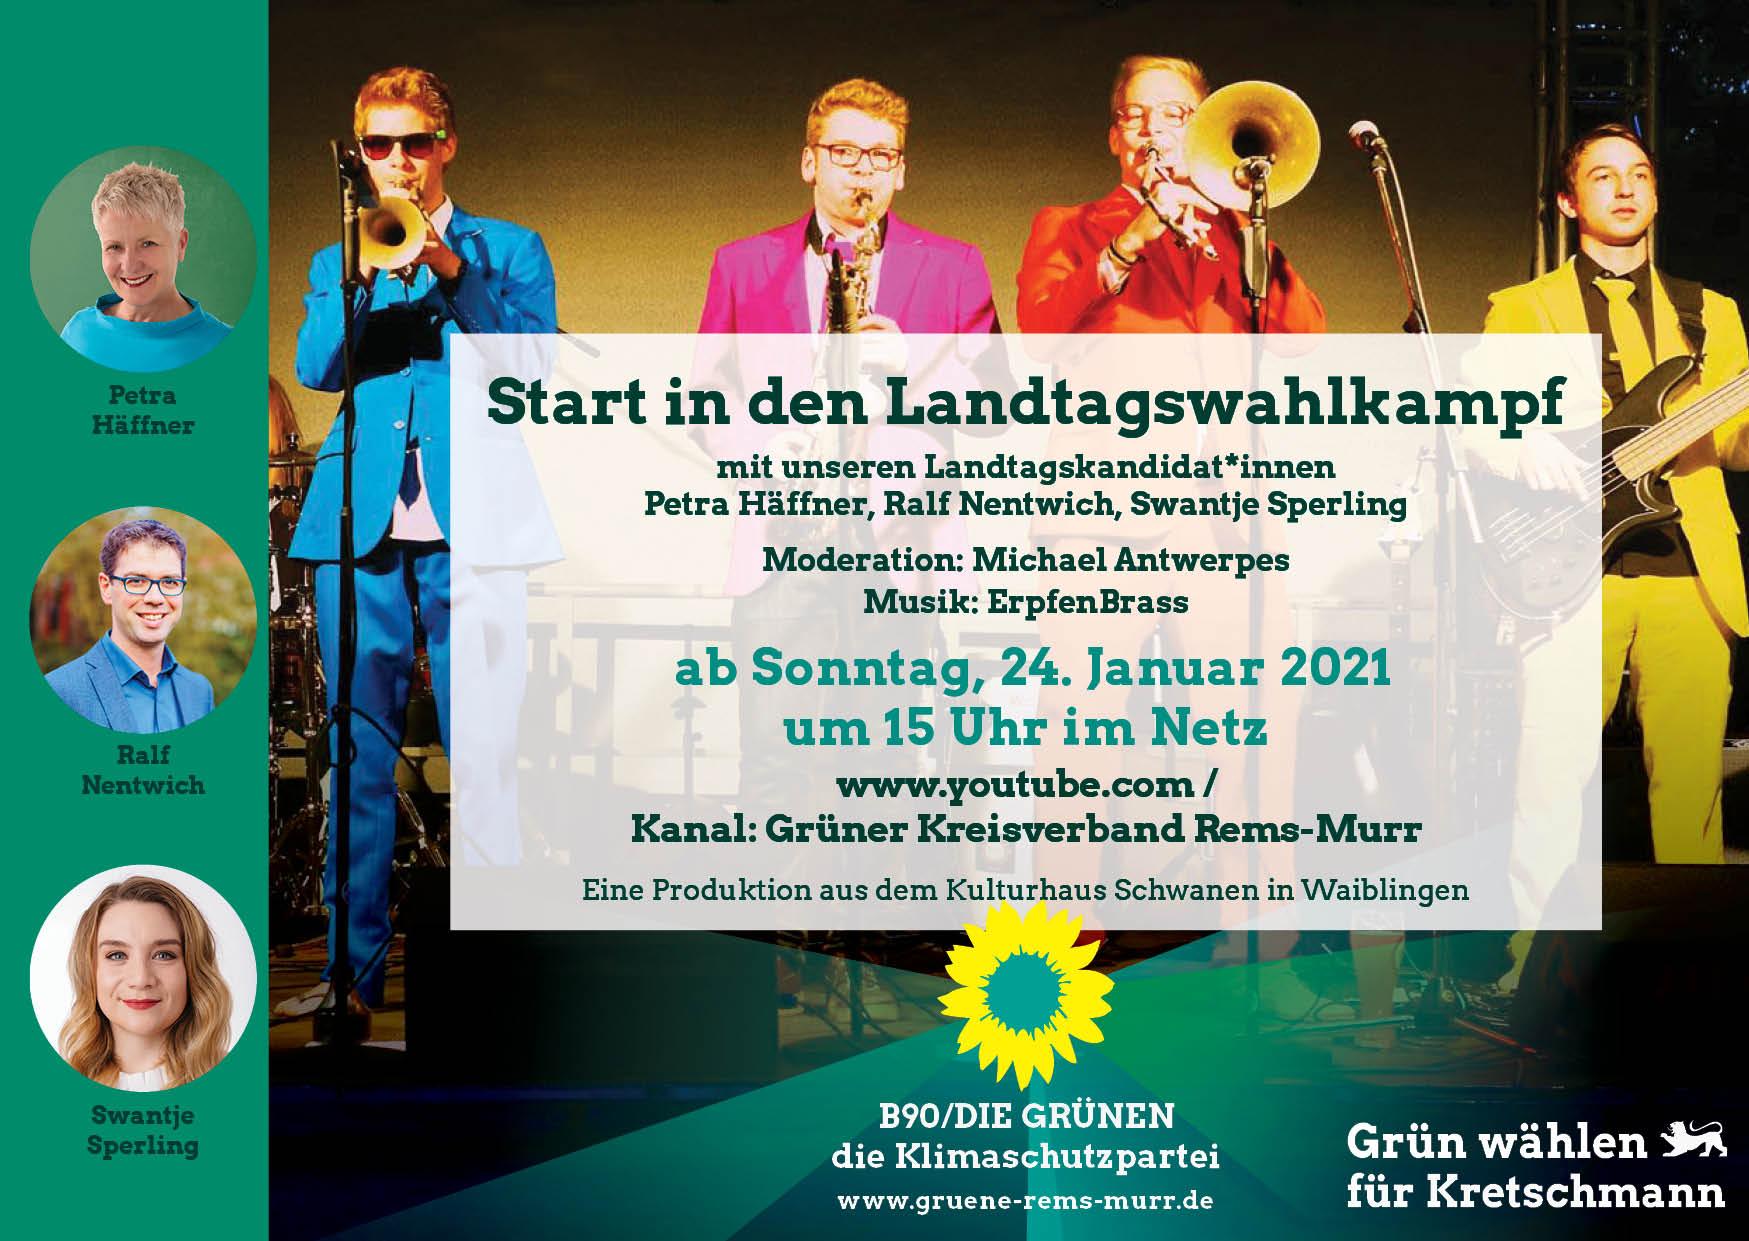 Offizieller Start in den Landtagswahlkampf 2021 – Kandidat:innen-Vorstellung